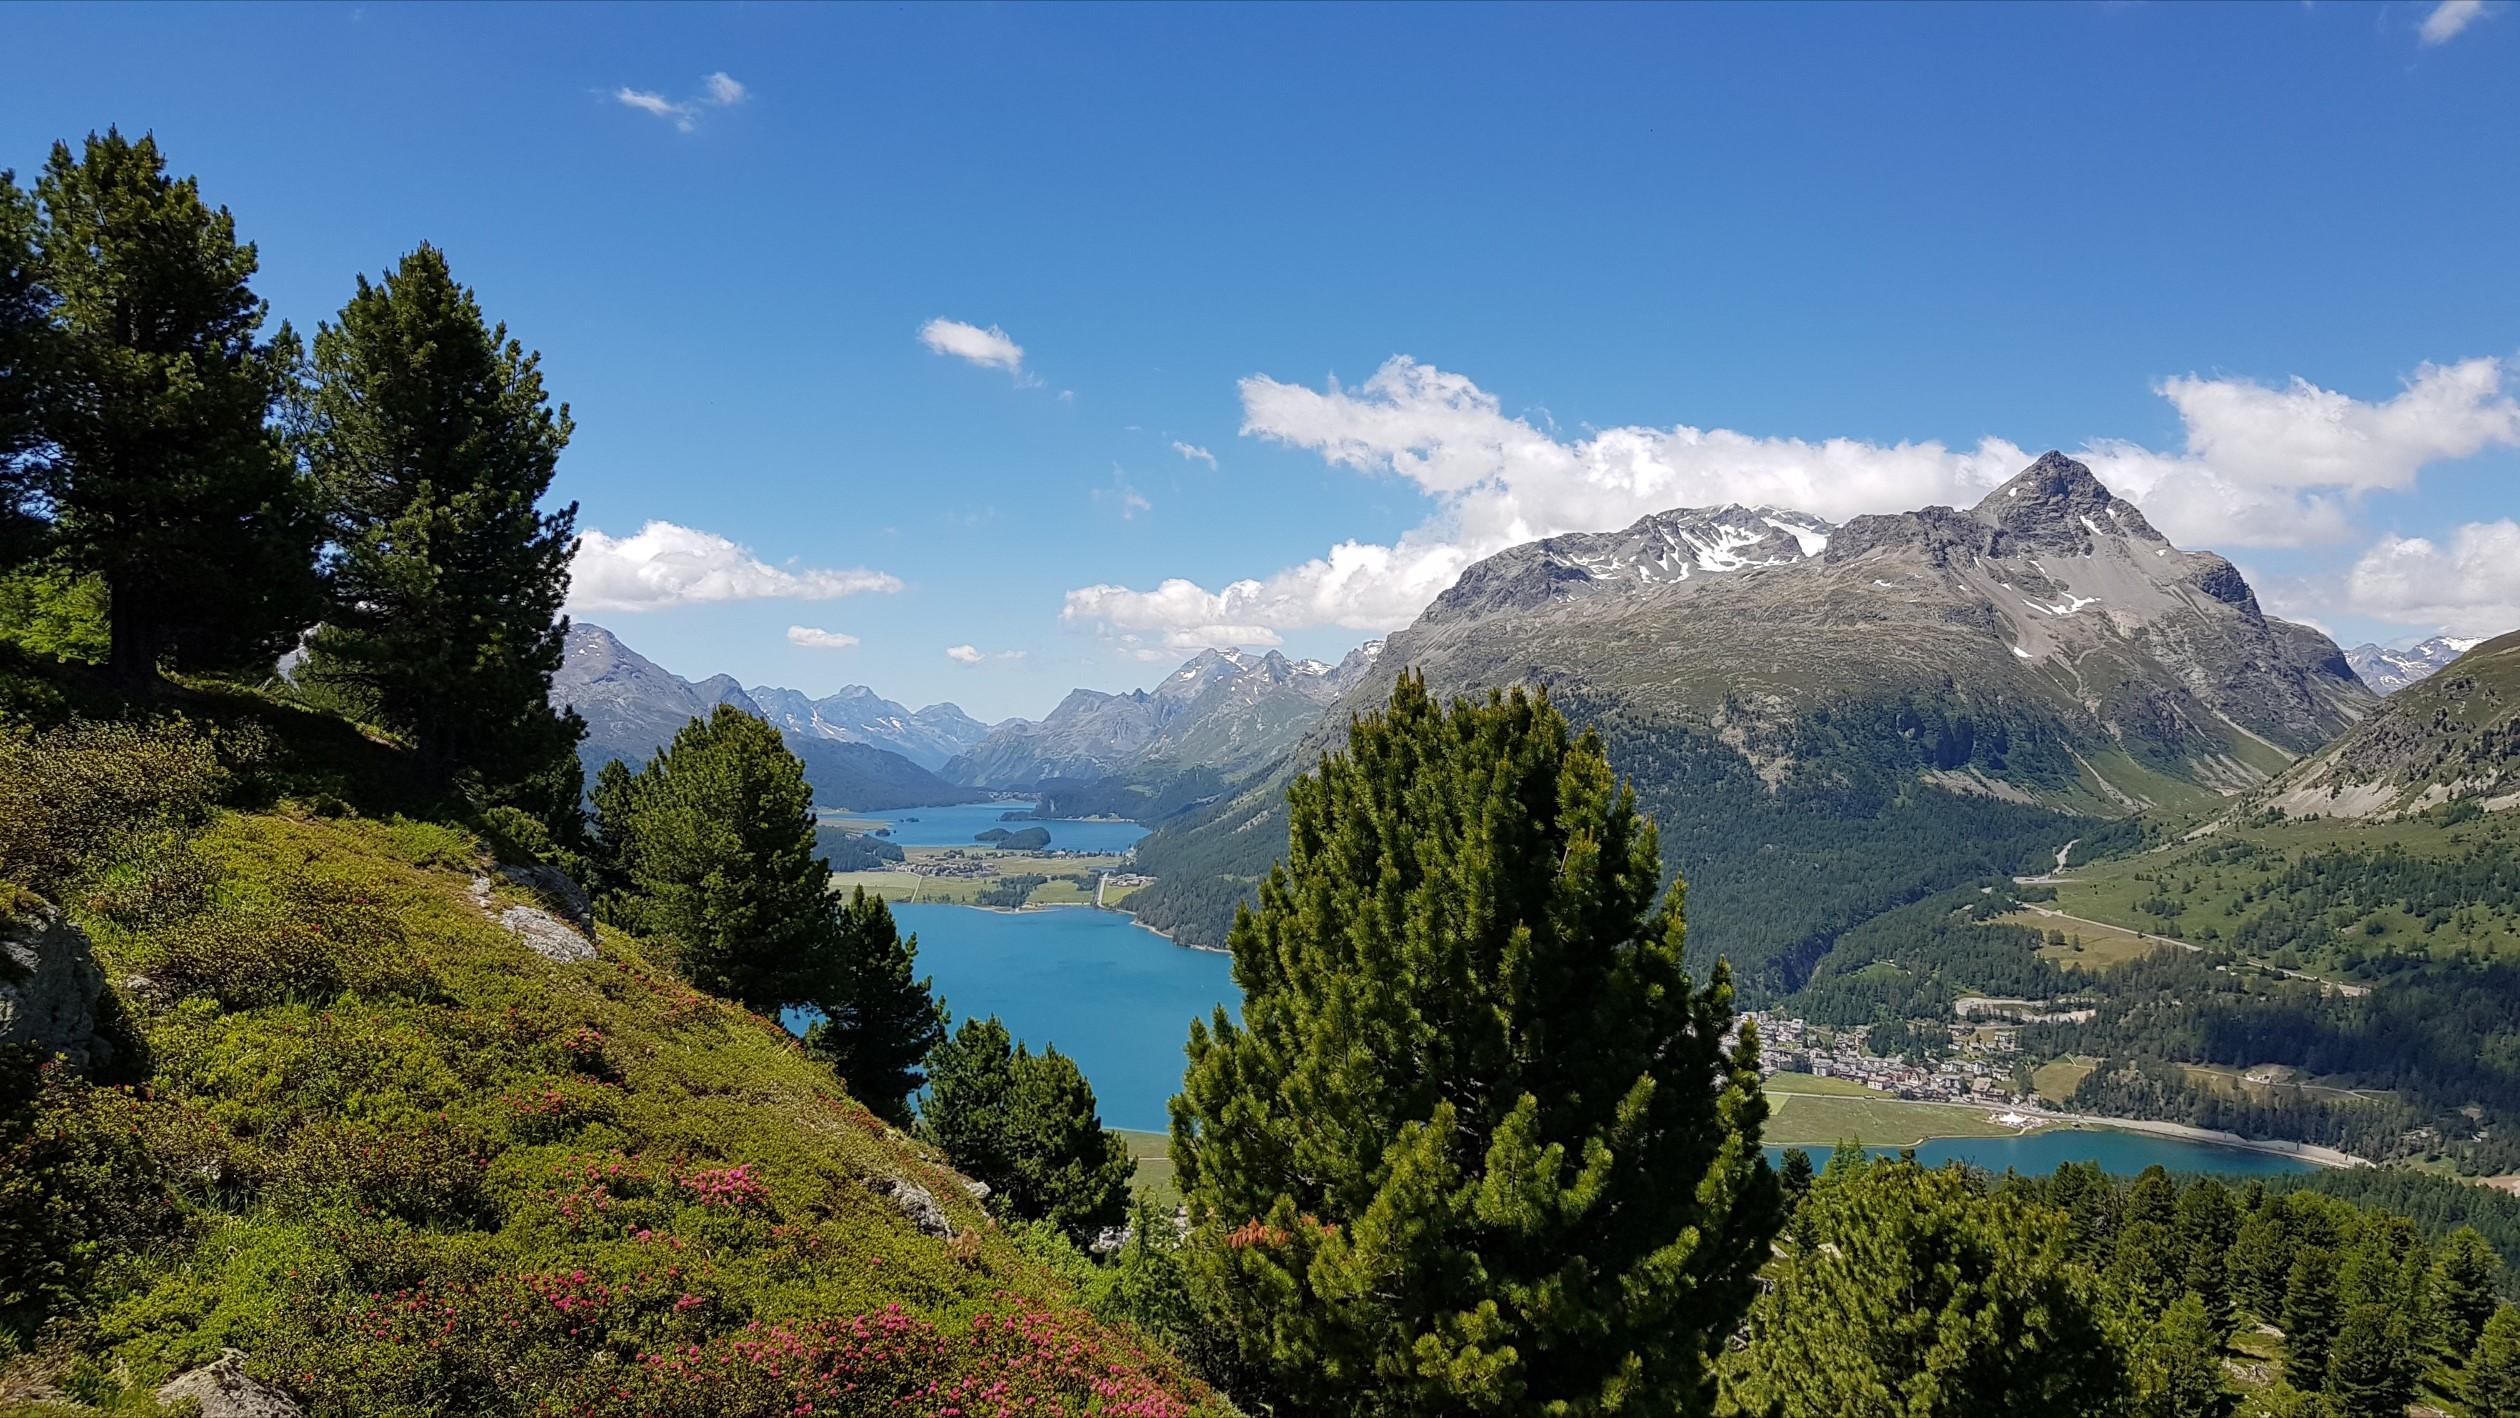 Engadine, St. Moritz, Hahnensee, view in direction Maloja with Lej da Champfer, Lake Silvaplana, Lake Sils, Chaste